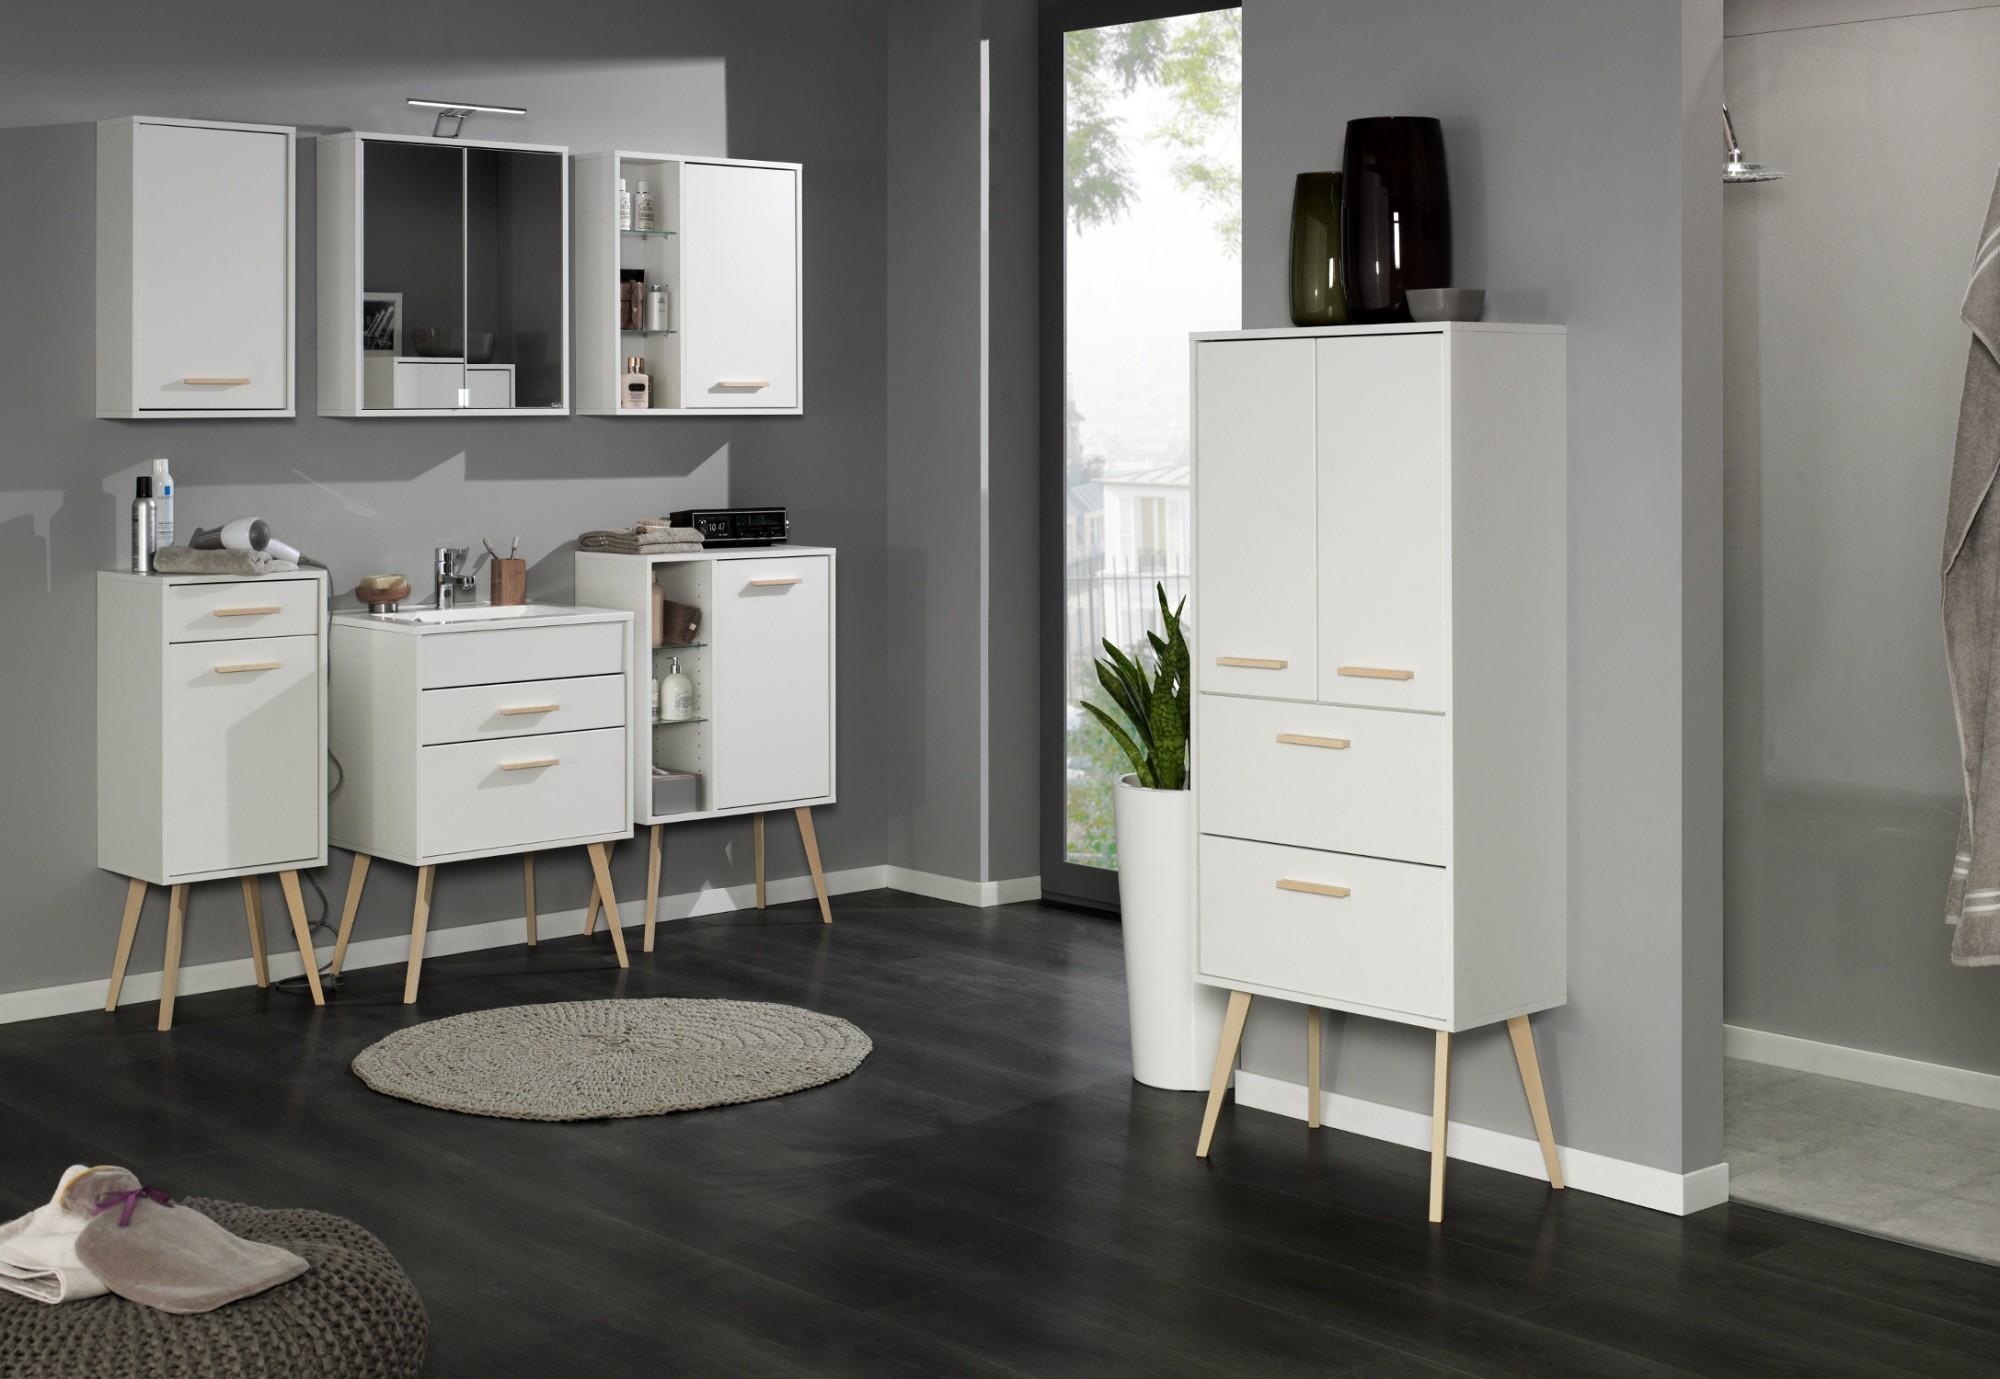 badezimmer waschtisch mit becken malm waschplatz 100 cm weiss matt ebay. Black Bedroom Furniture Sets. Home Design Ideas